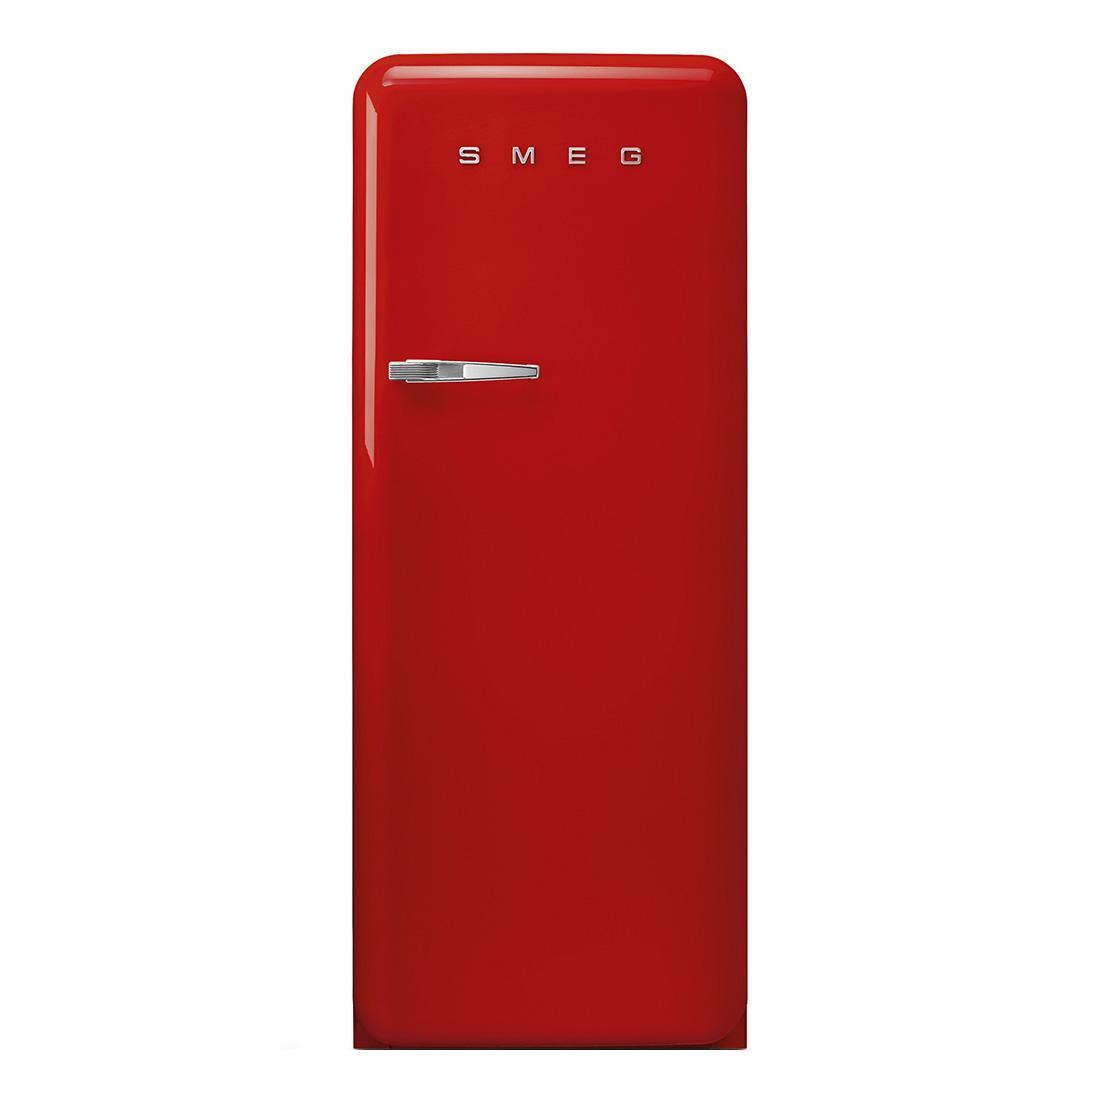 Smeg - FAB28 Standkühlschrank - rot/lackiert/LIFE PLUS 0°C-ZONE/Rechtsanschlag/BxHxT 60x150x78|8cm/höhenverstellbar | Küche und Esszimmer > Küchenelektrogeräte > Kühlschränke | Rot | Metall| kunststoff | Smeg